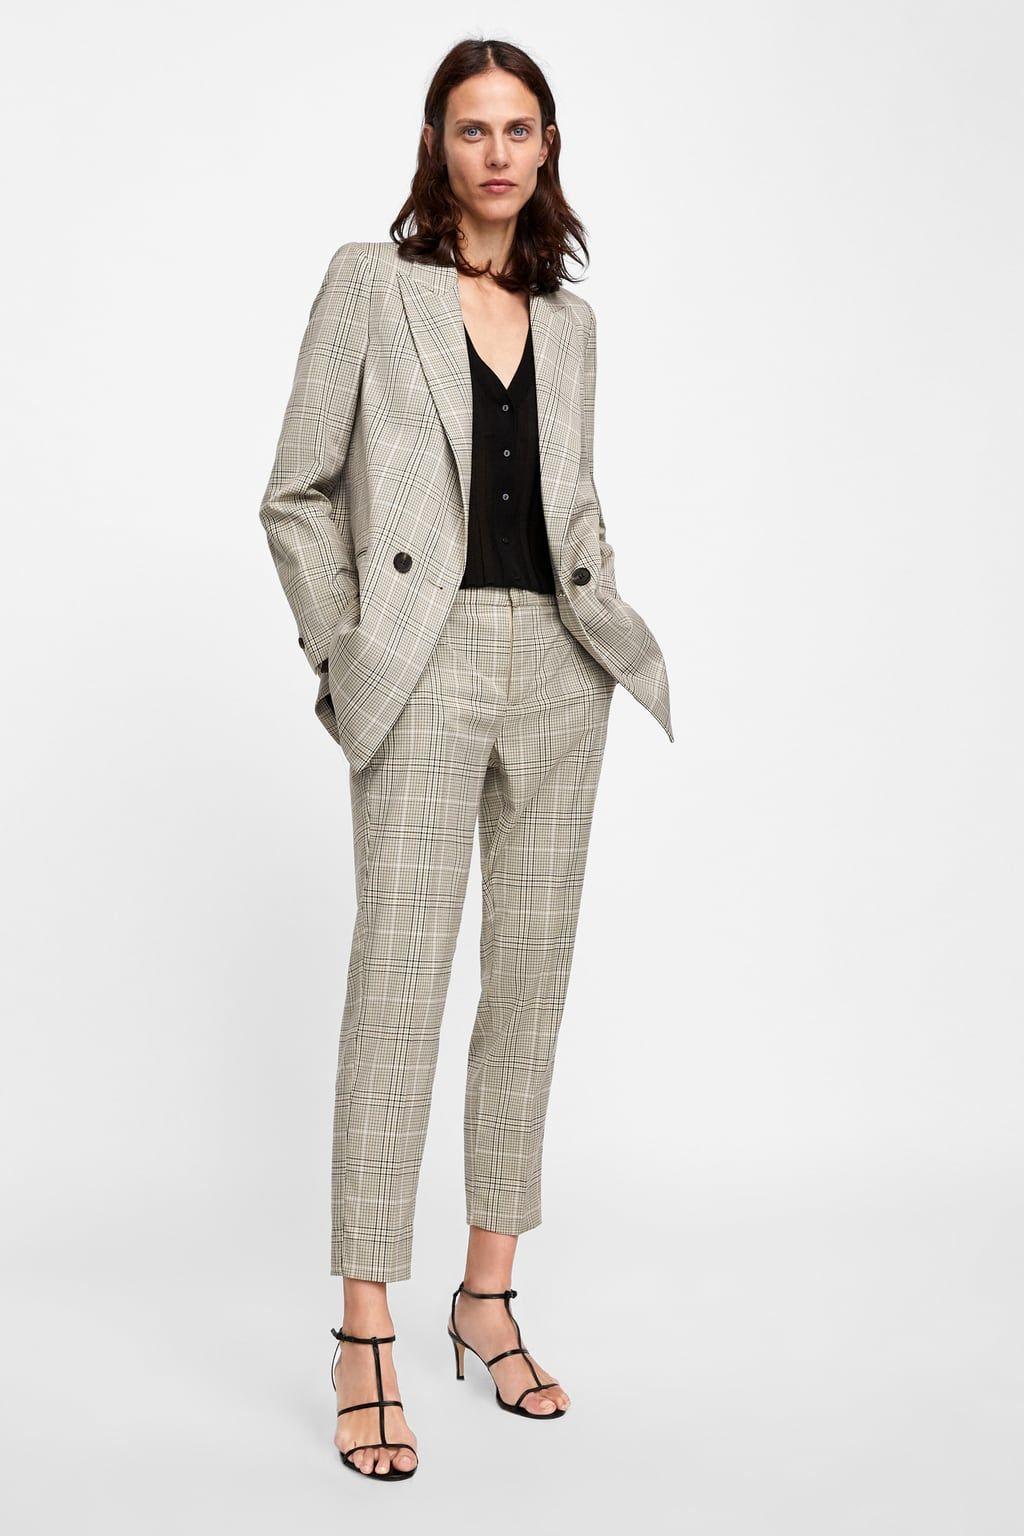 Pantalon Pitillo Cuadros Zara Mujer Pantalones Pitillos Rebajas Mujer